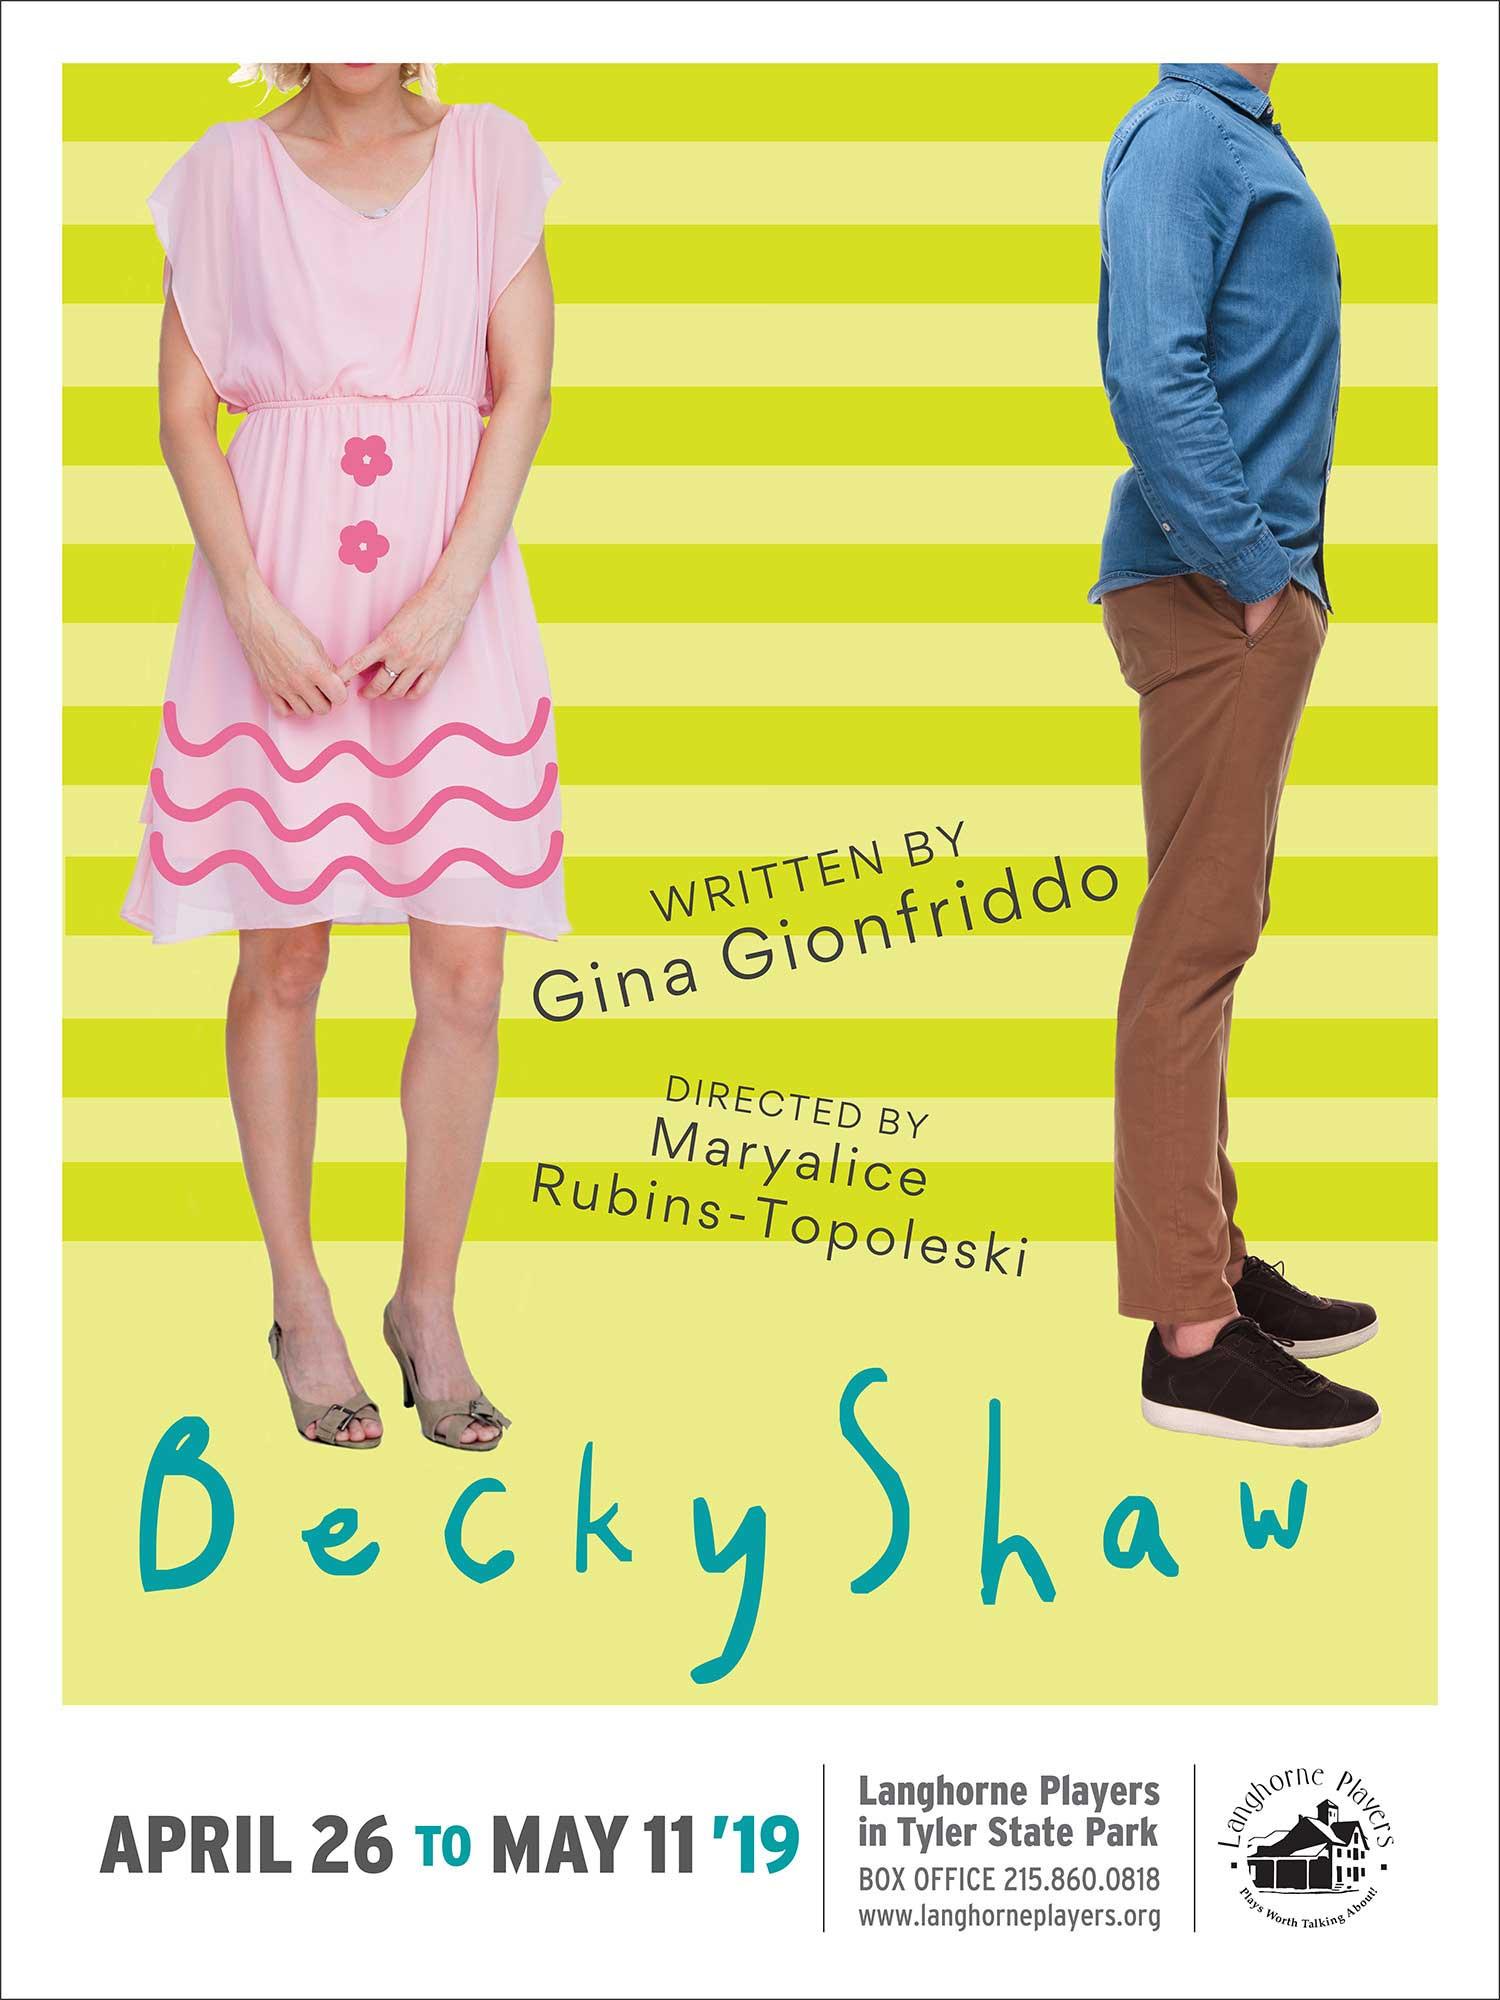 becky_shaw_poster.jpg